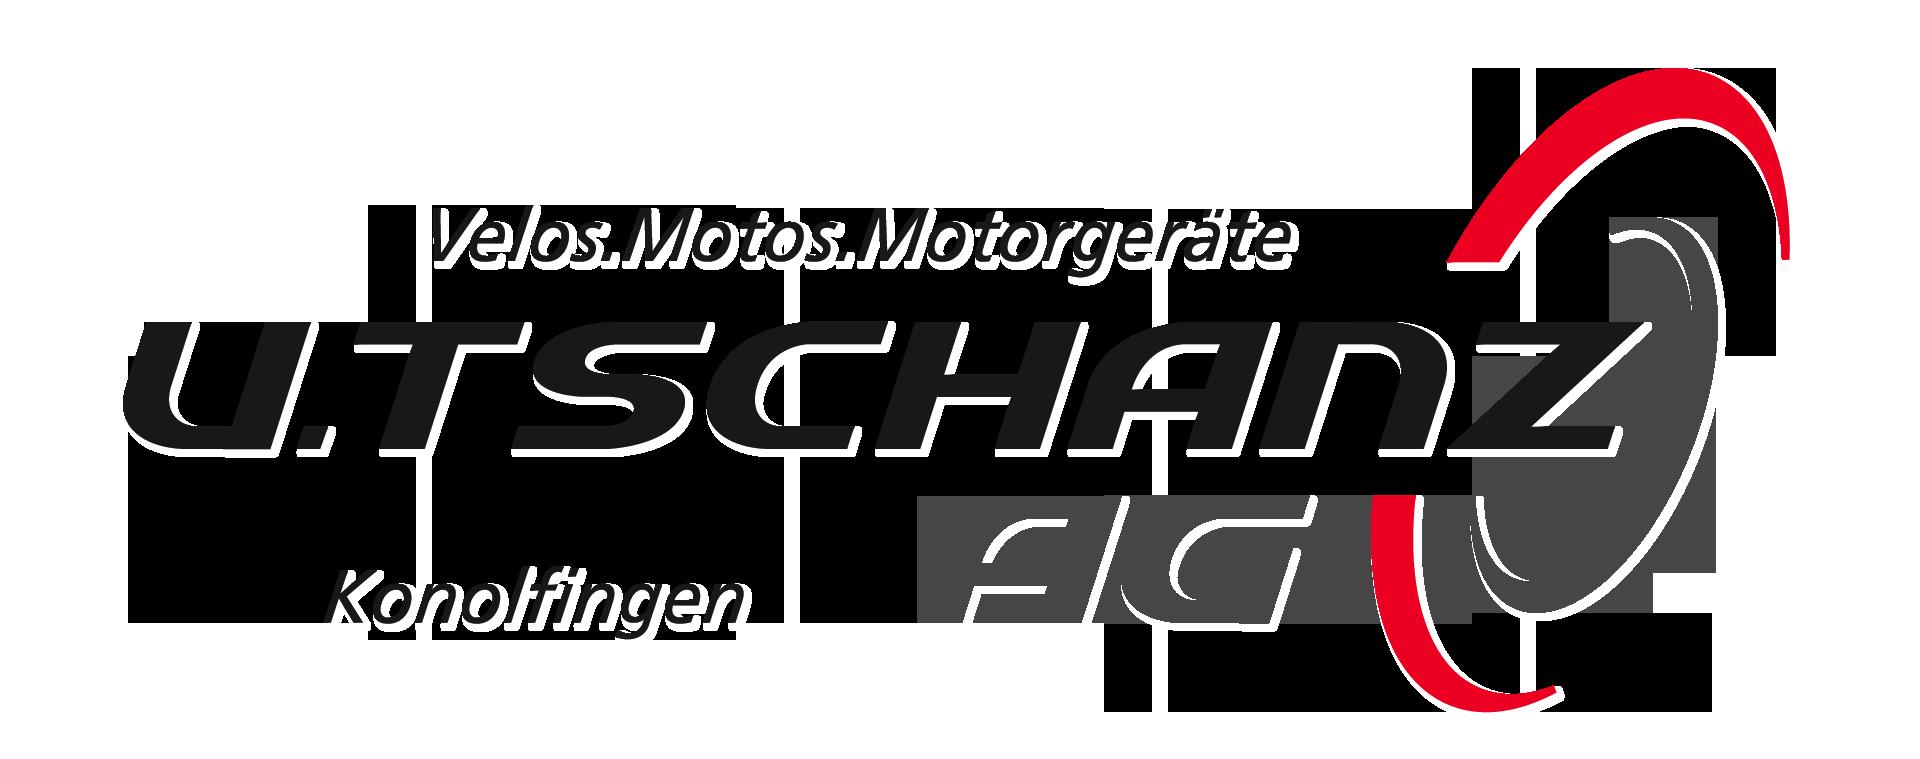 U. Tschanz AG, Konolfingen, Honda, Velos, Motos